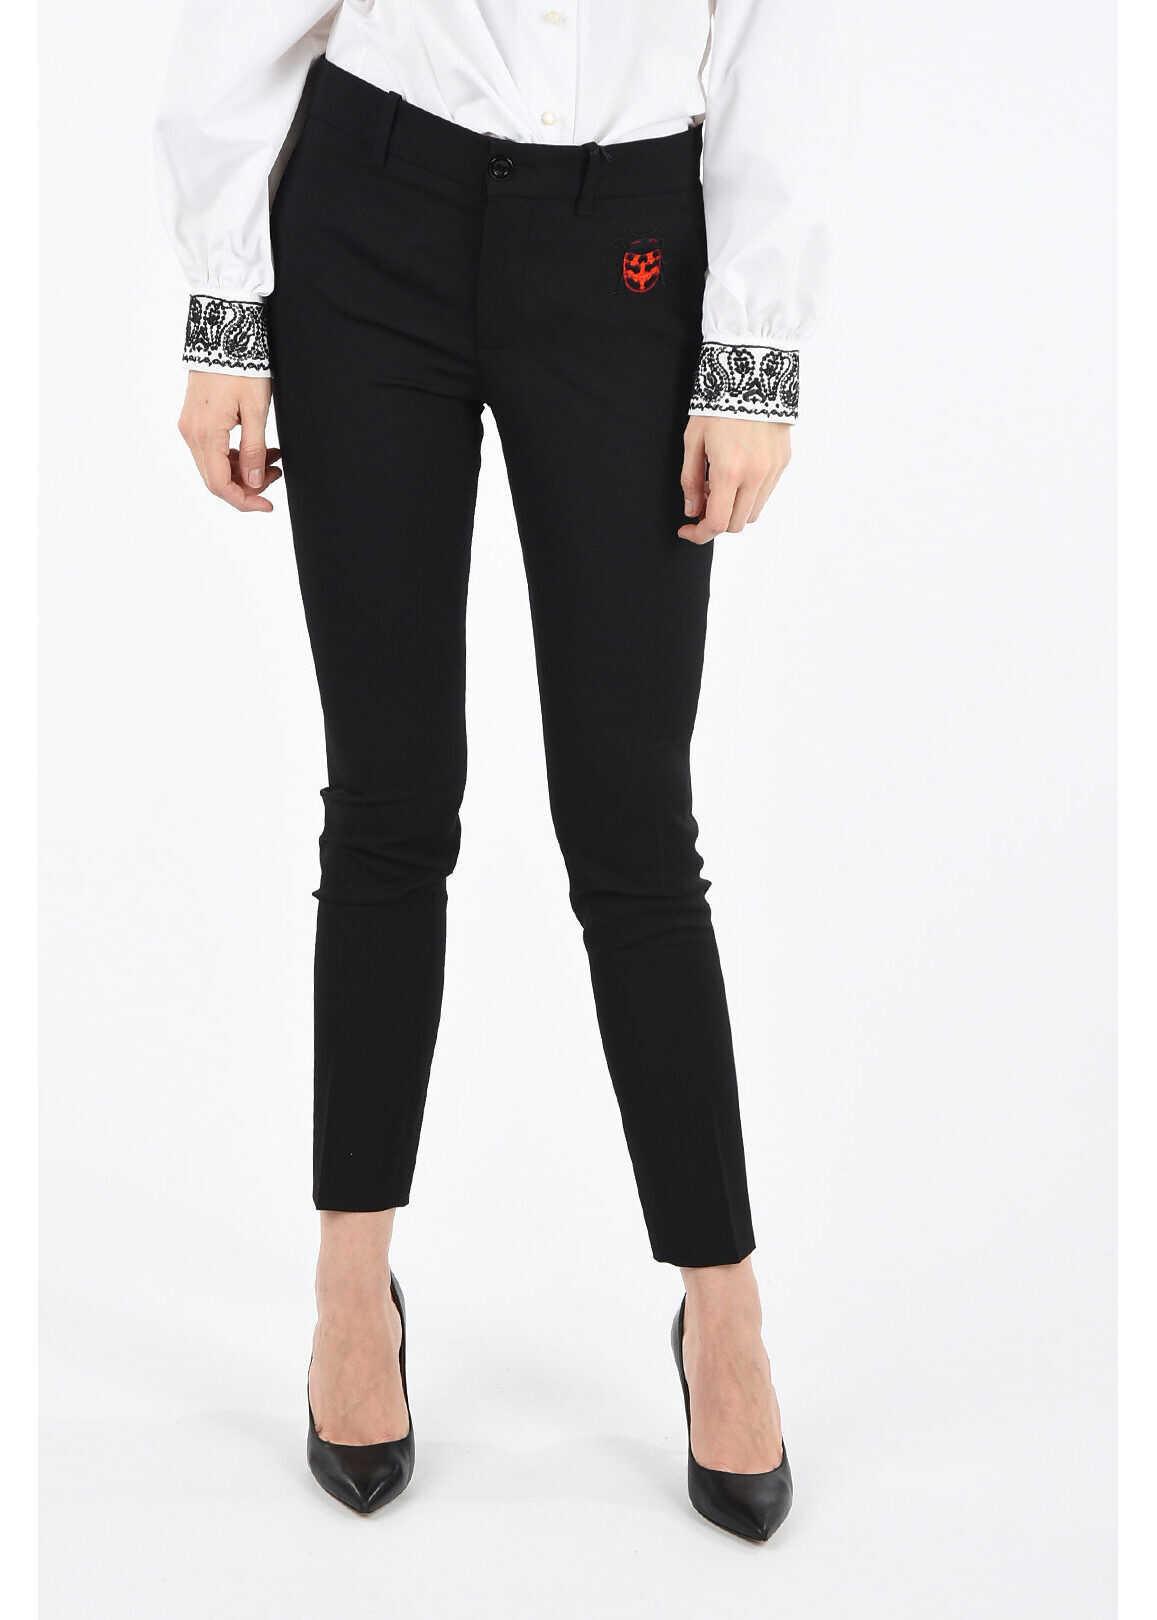 Gucci slim fit single pleat pants BLACK